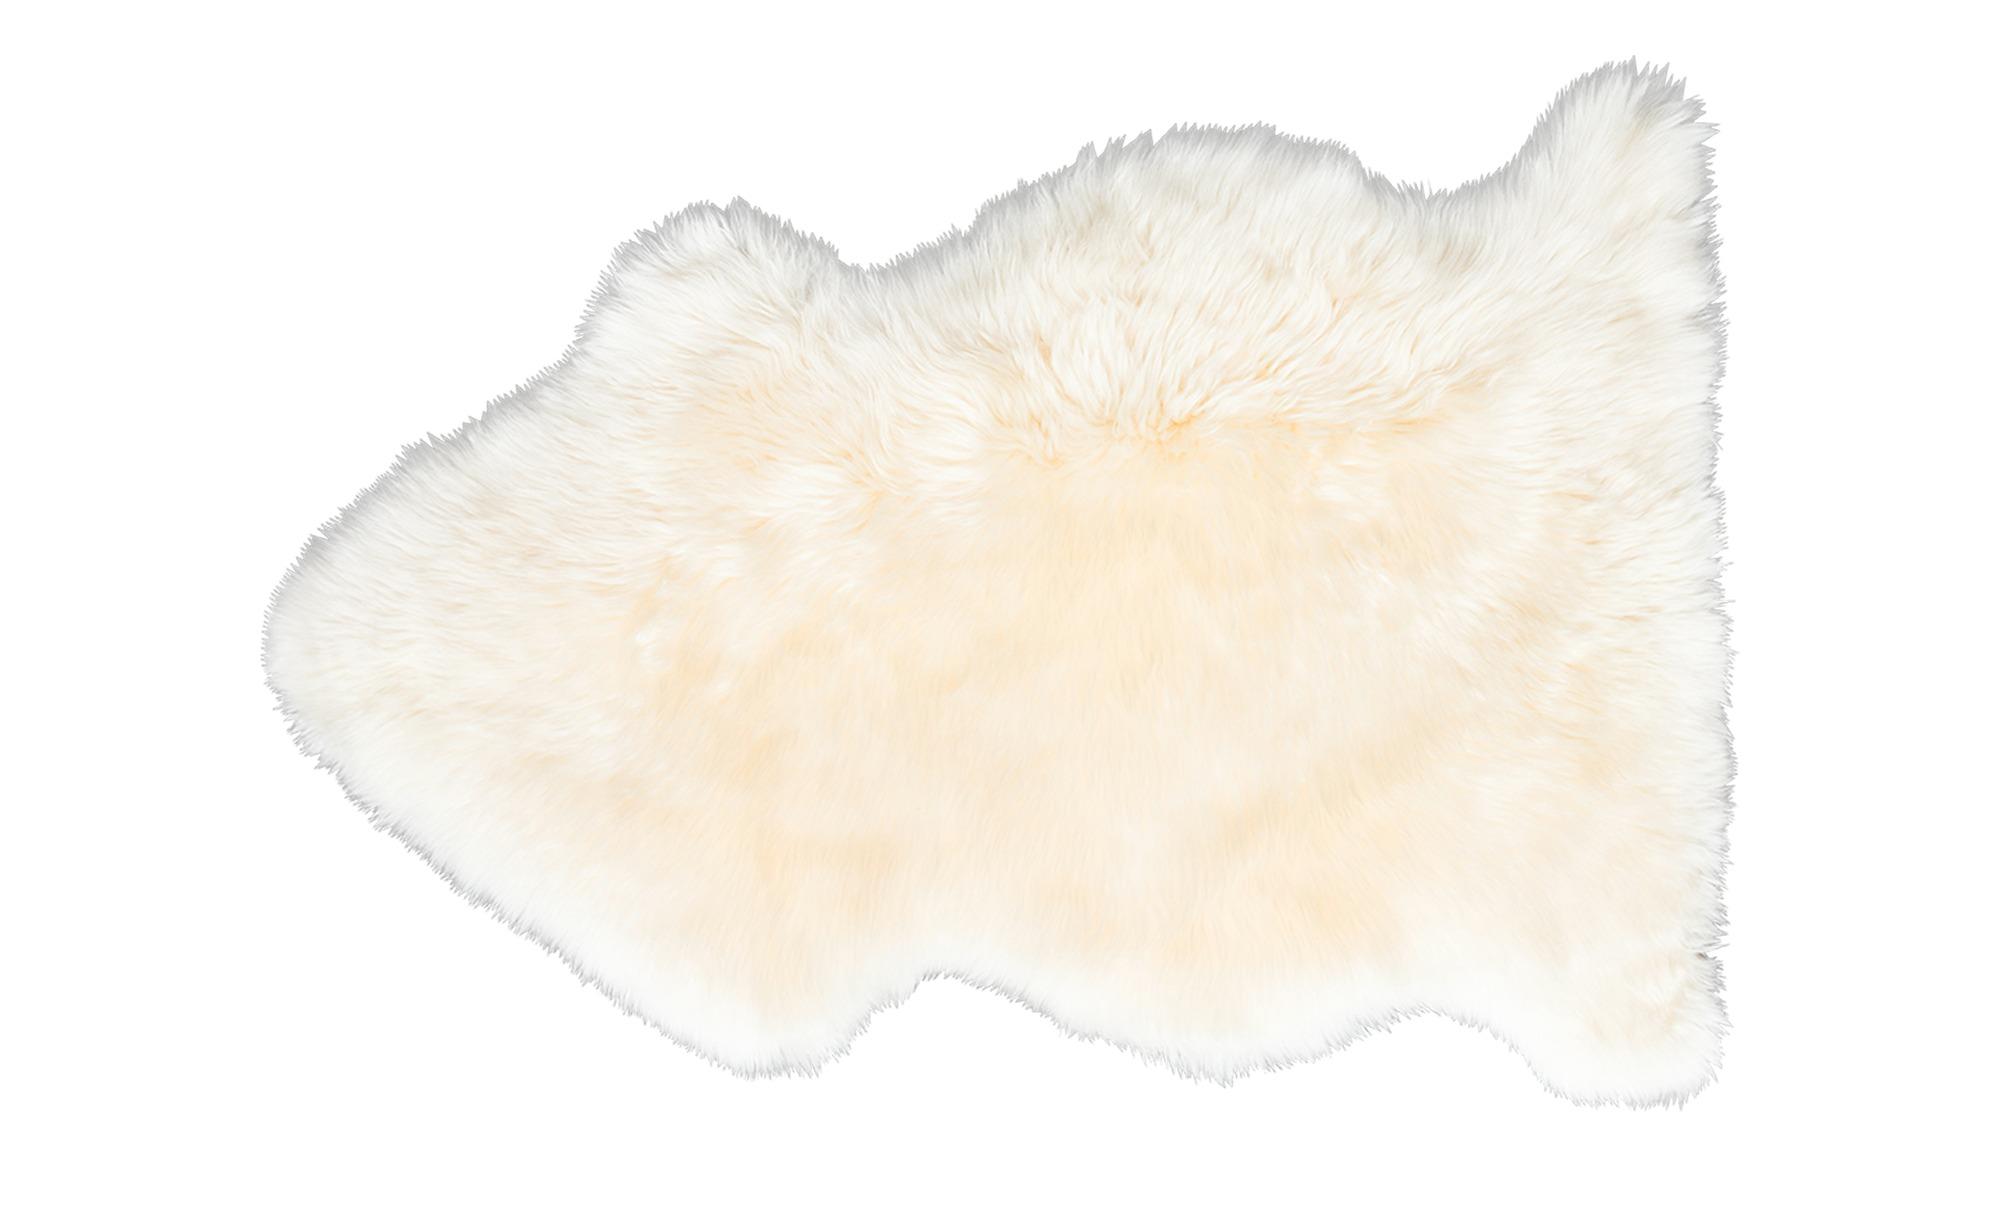 Wollschaf-Lammfell ¦ beige ¦ 100% Lammfell ¦ Maße (cm): B: 73 Teppiche > Felle - Höffner